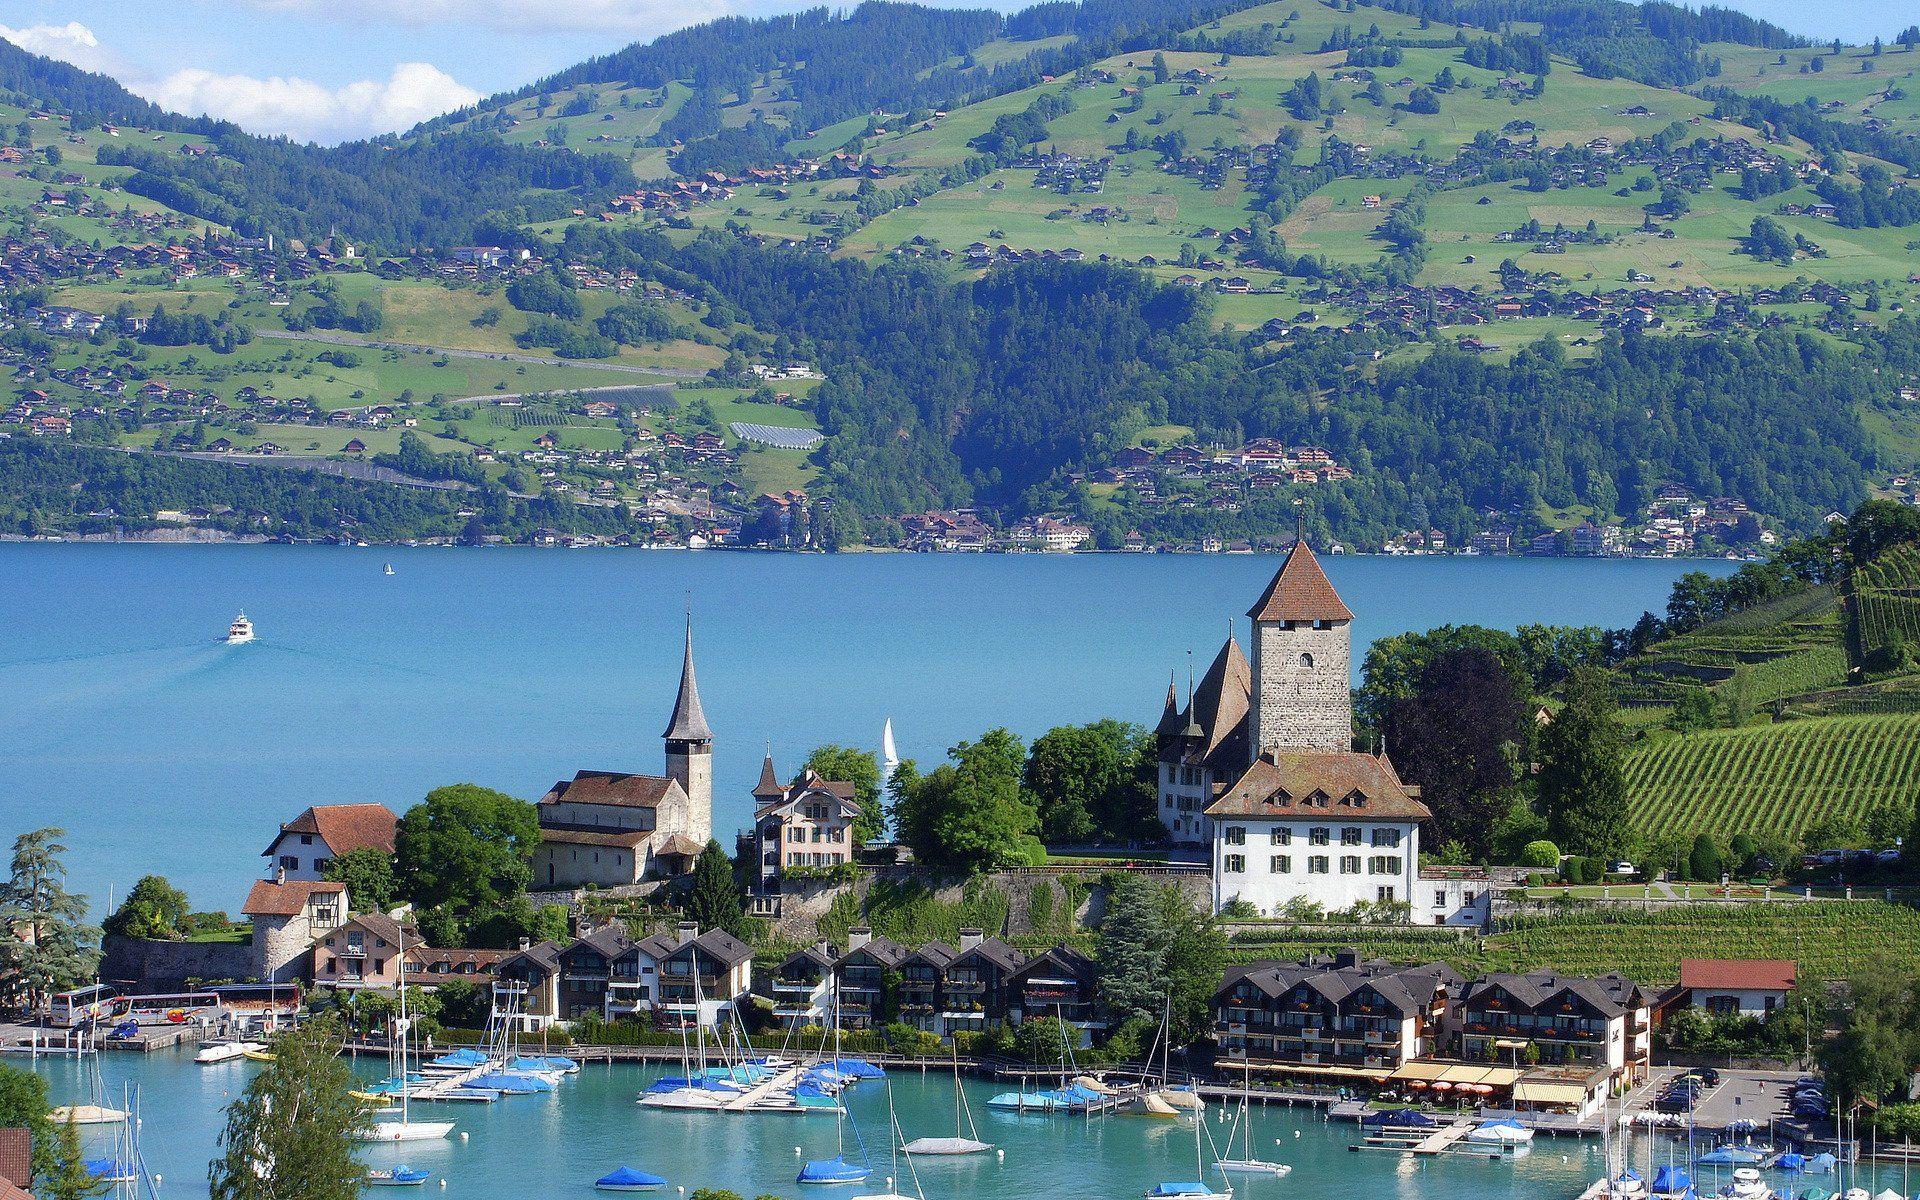 Interlaken in Switzerland [1920x1200] Beautiful Wallpaper 1920x1200